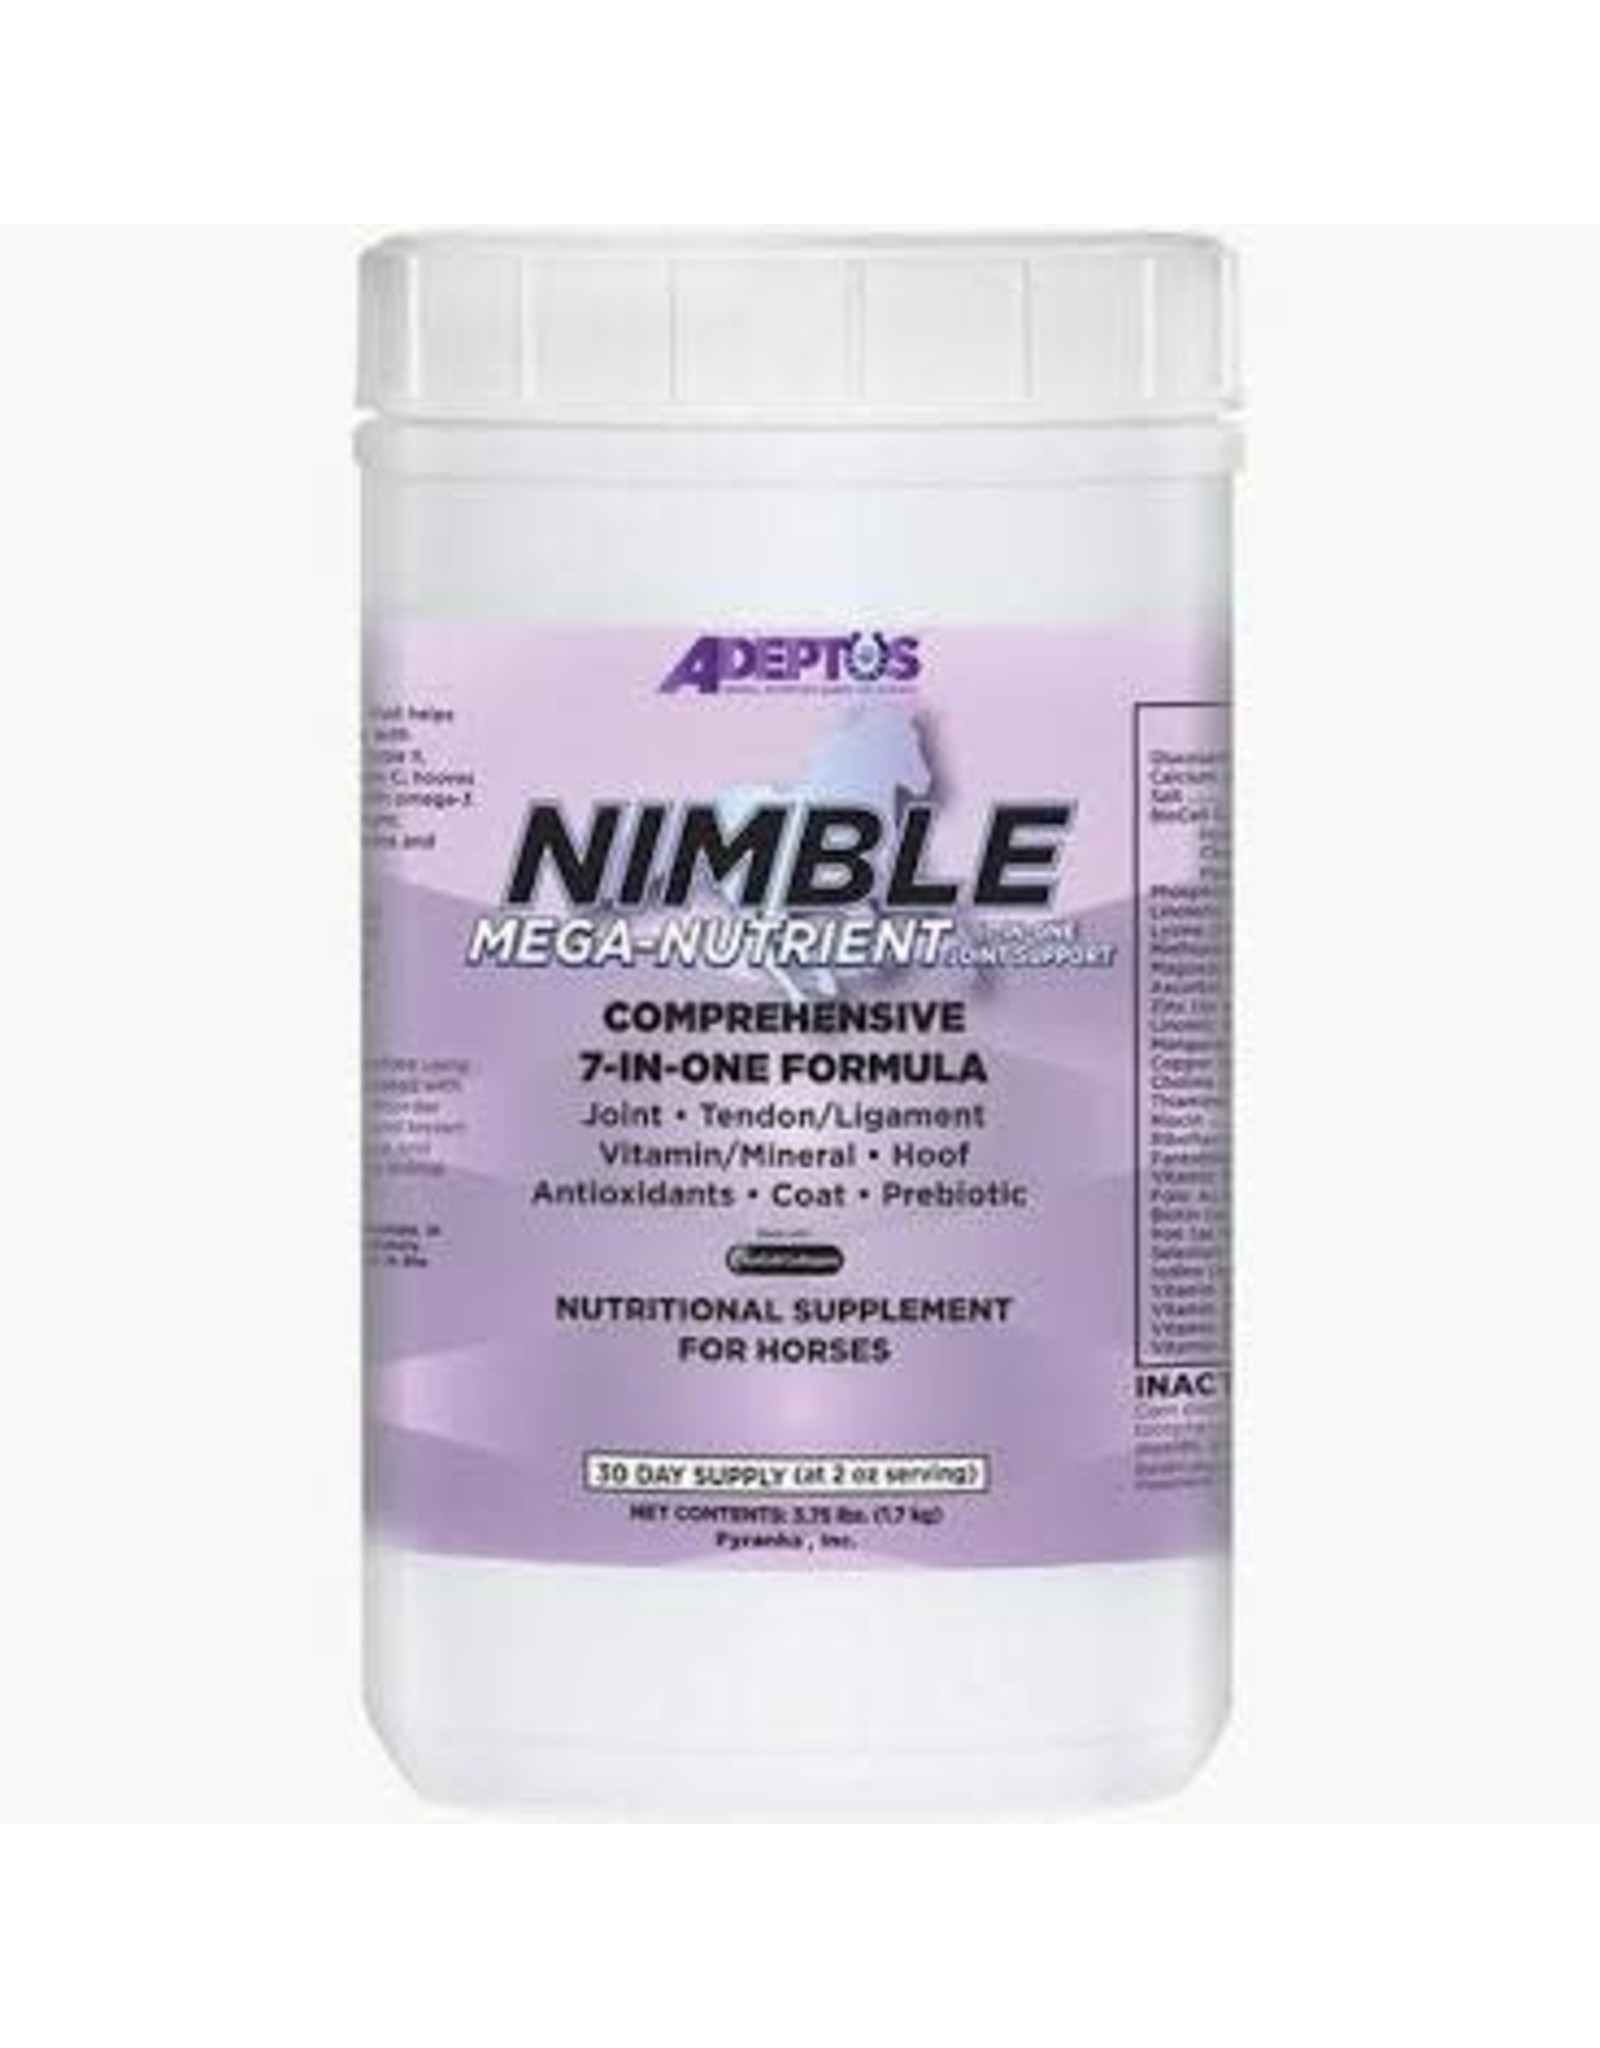 Adeptus Nimble Mega Nutrient